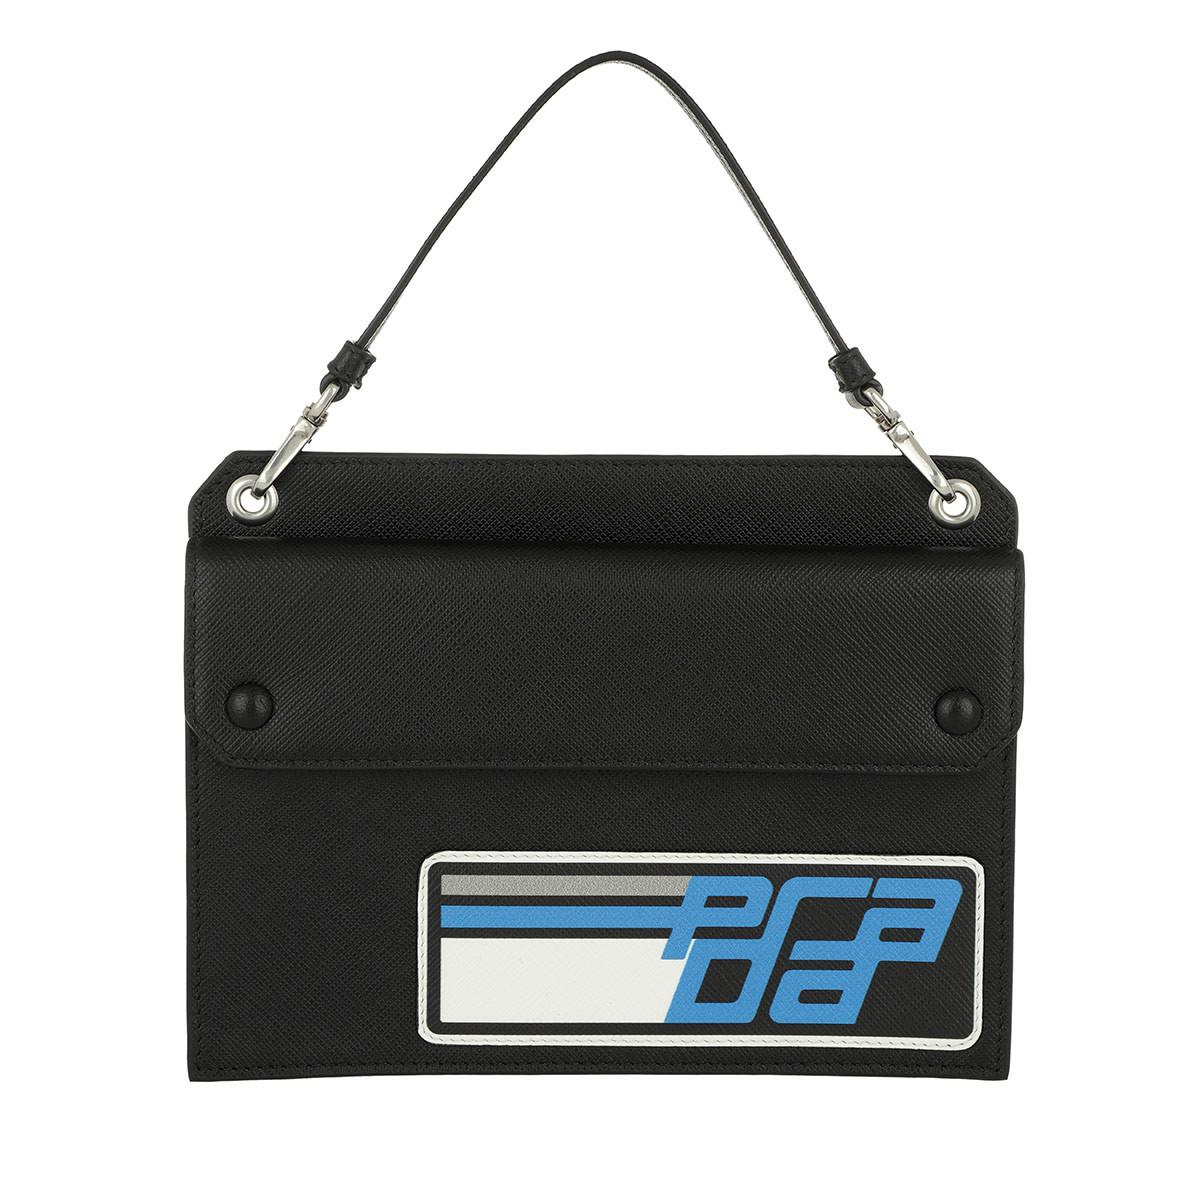 9c9b5658ec24 ... promo code prada. womens logo mini bag leather black blue 151bc ff429